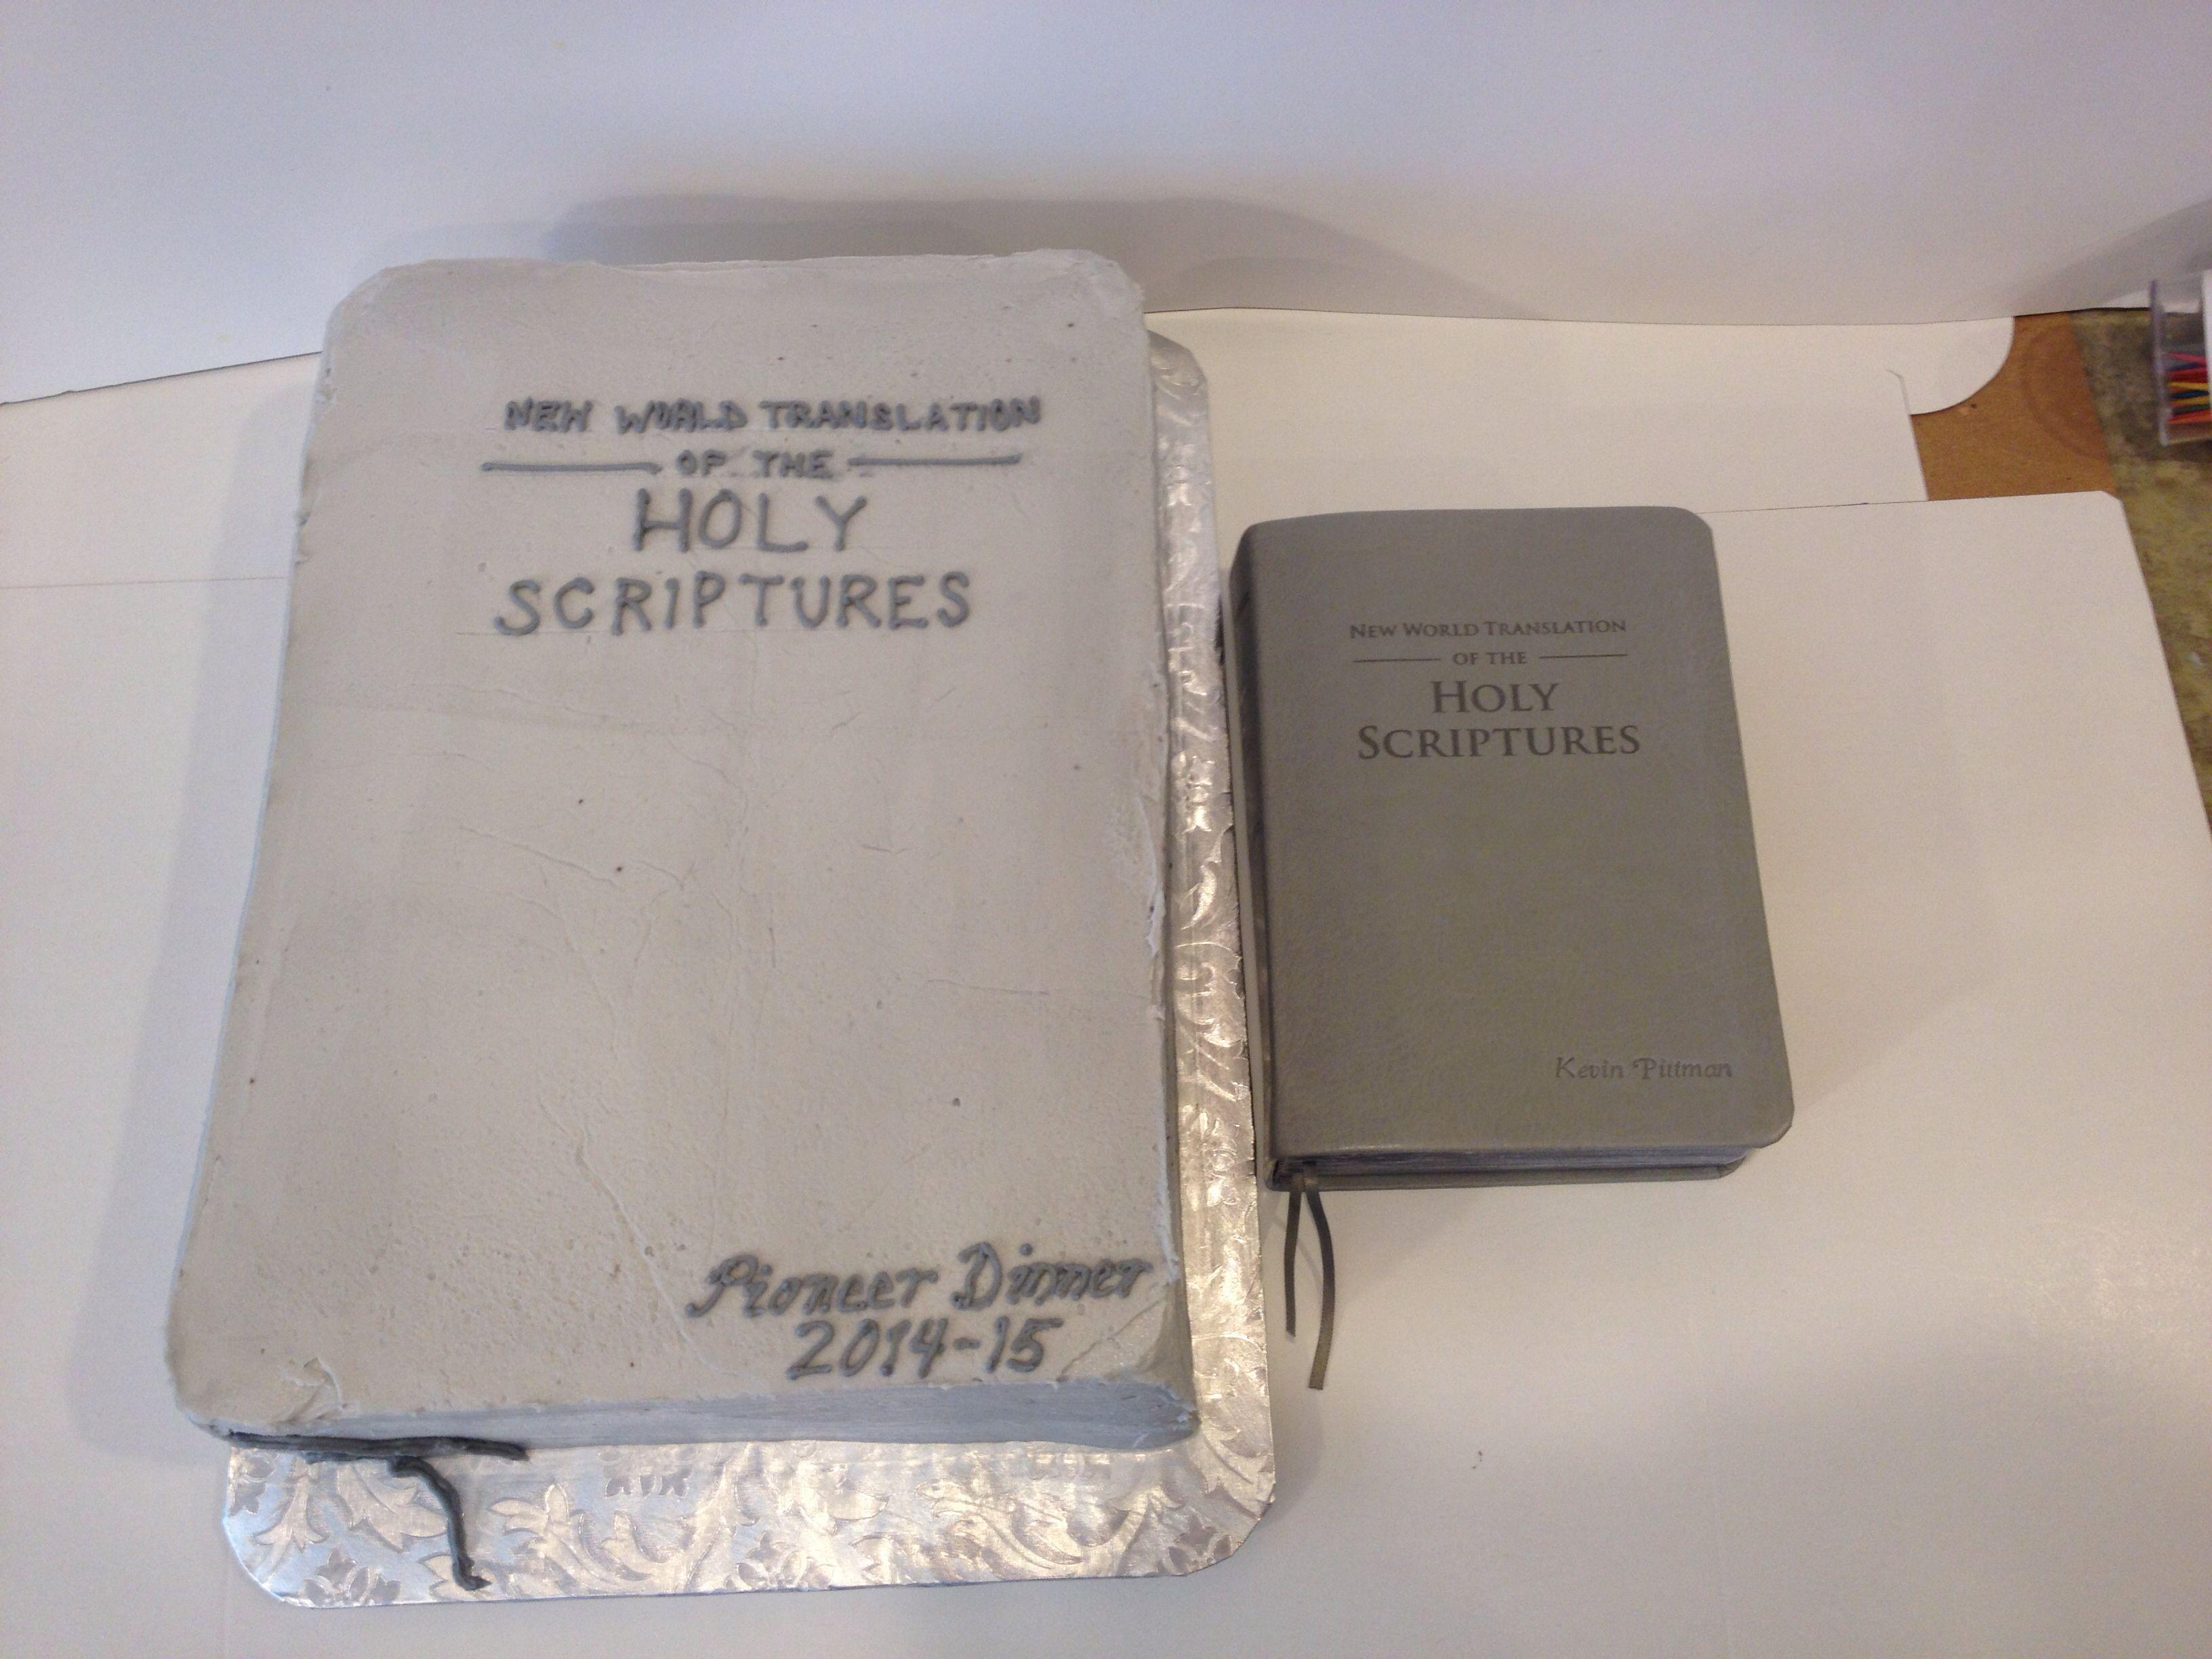 Pioneer dinner cake. New World Translation.